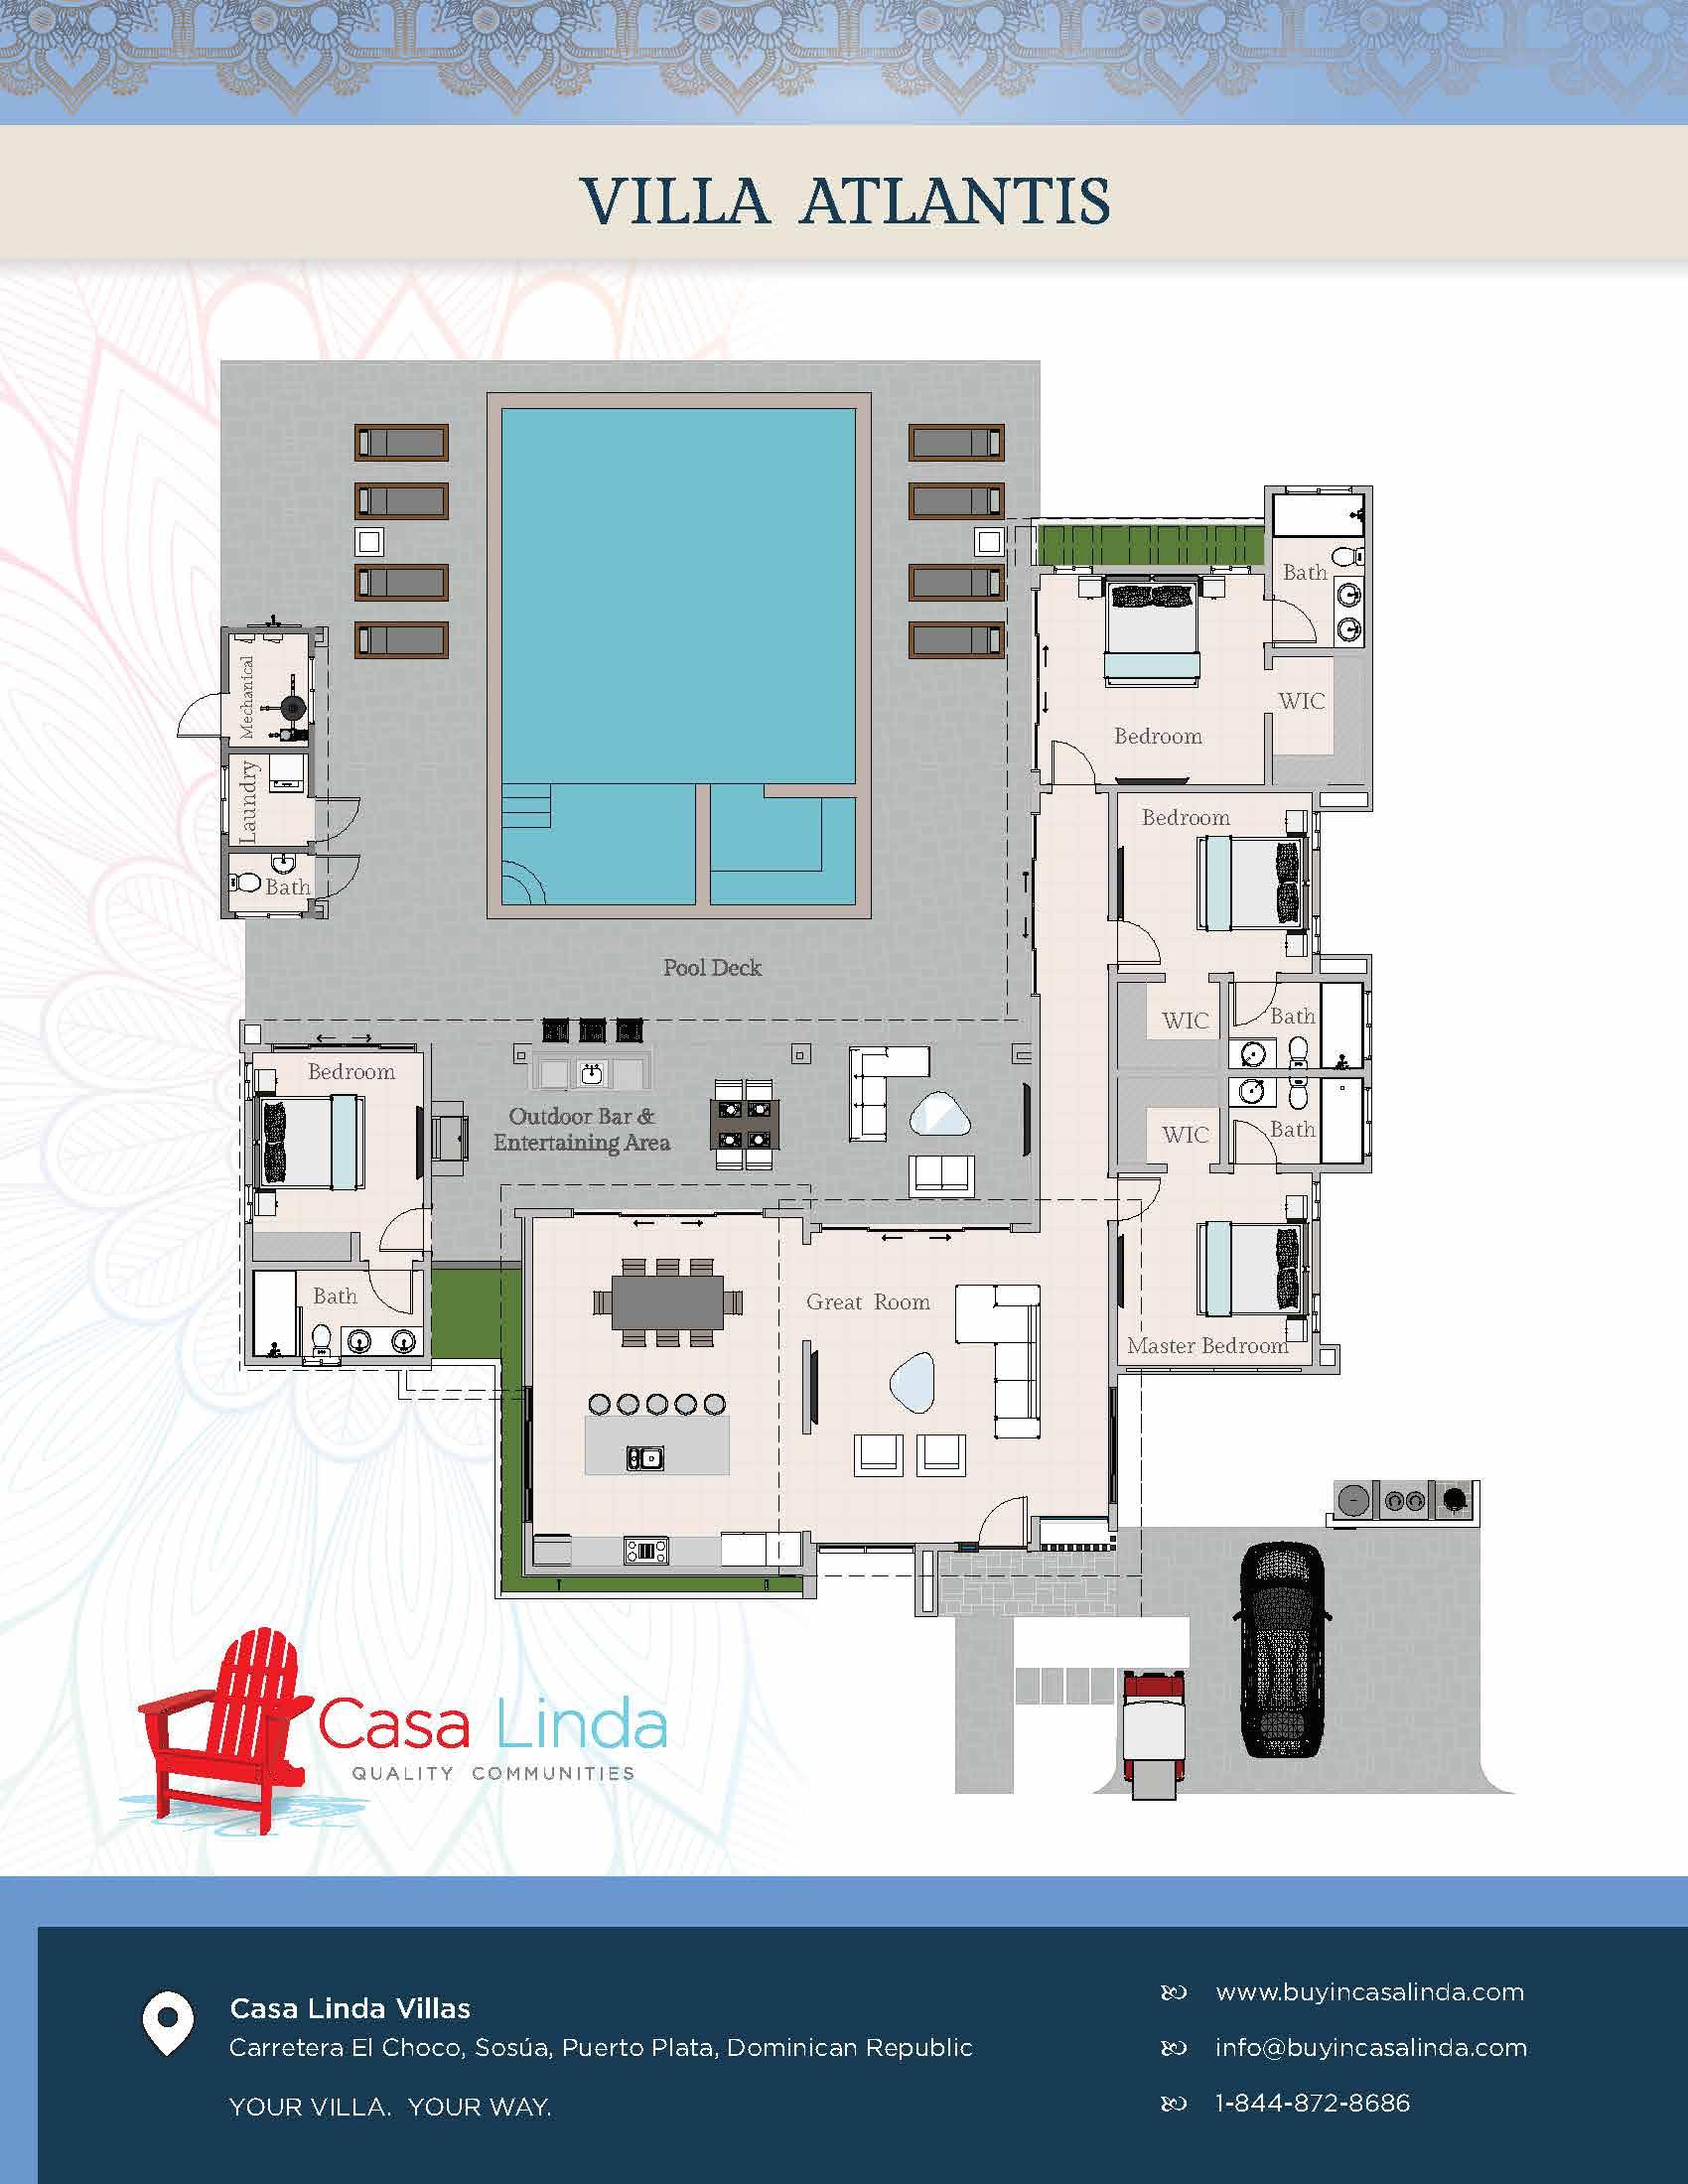 Villa Atlantis, Casa Linda Villas